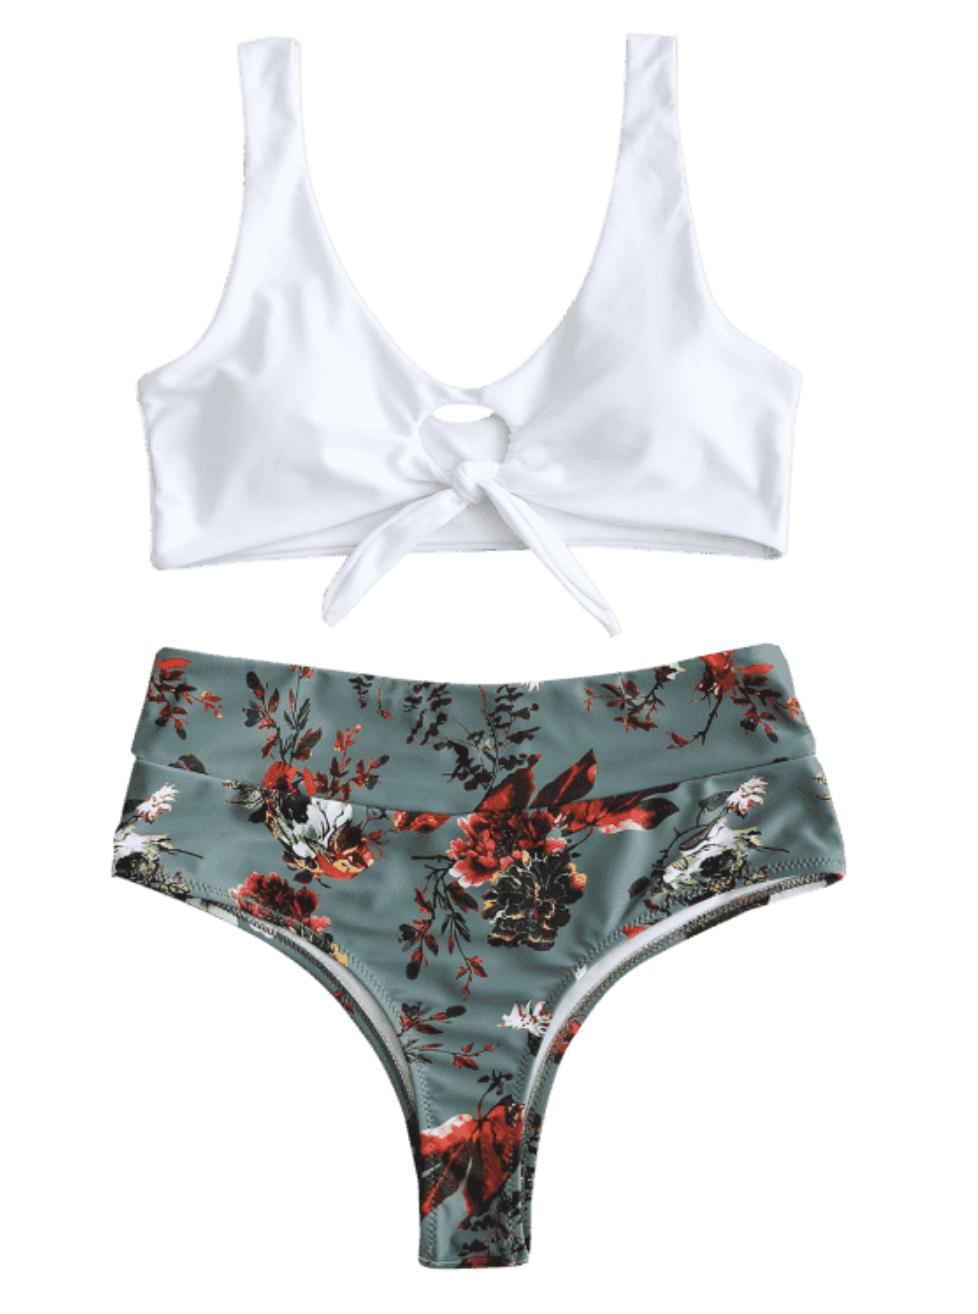 Front Knot Floral Bikini Set - Hazel Green | Cute, Sexy Honeymoon, Vacation, Summer Bikinis, Swim Suits | Miranda Schroeder Blog